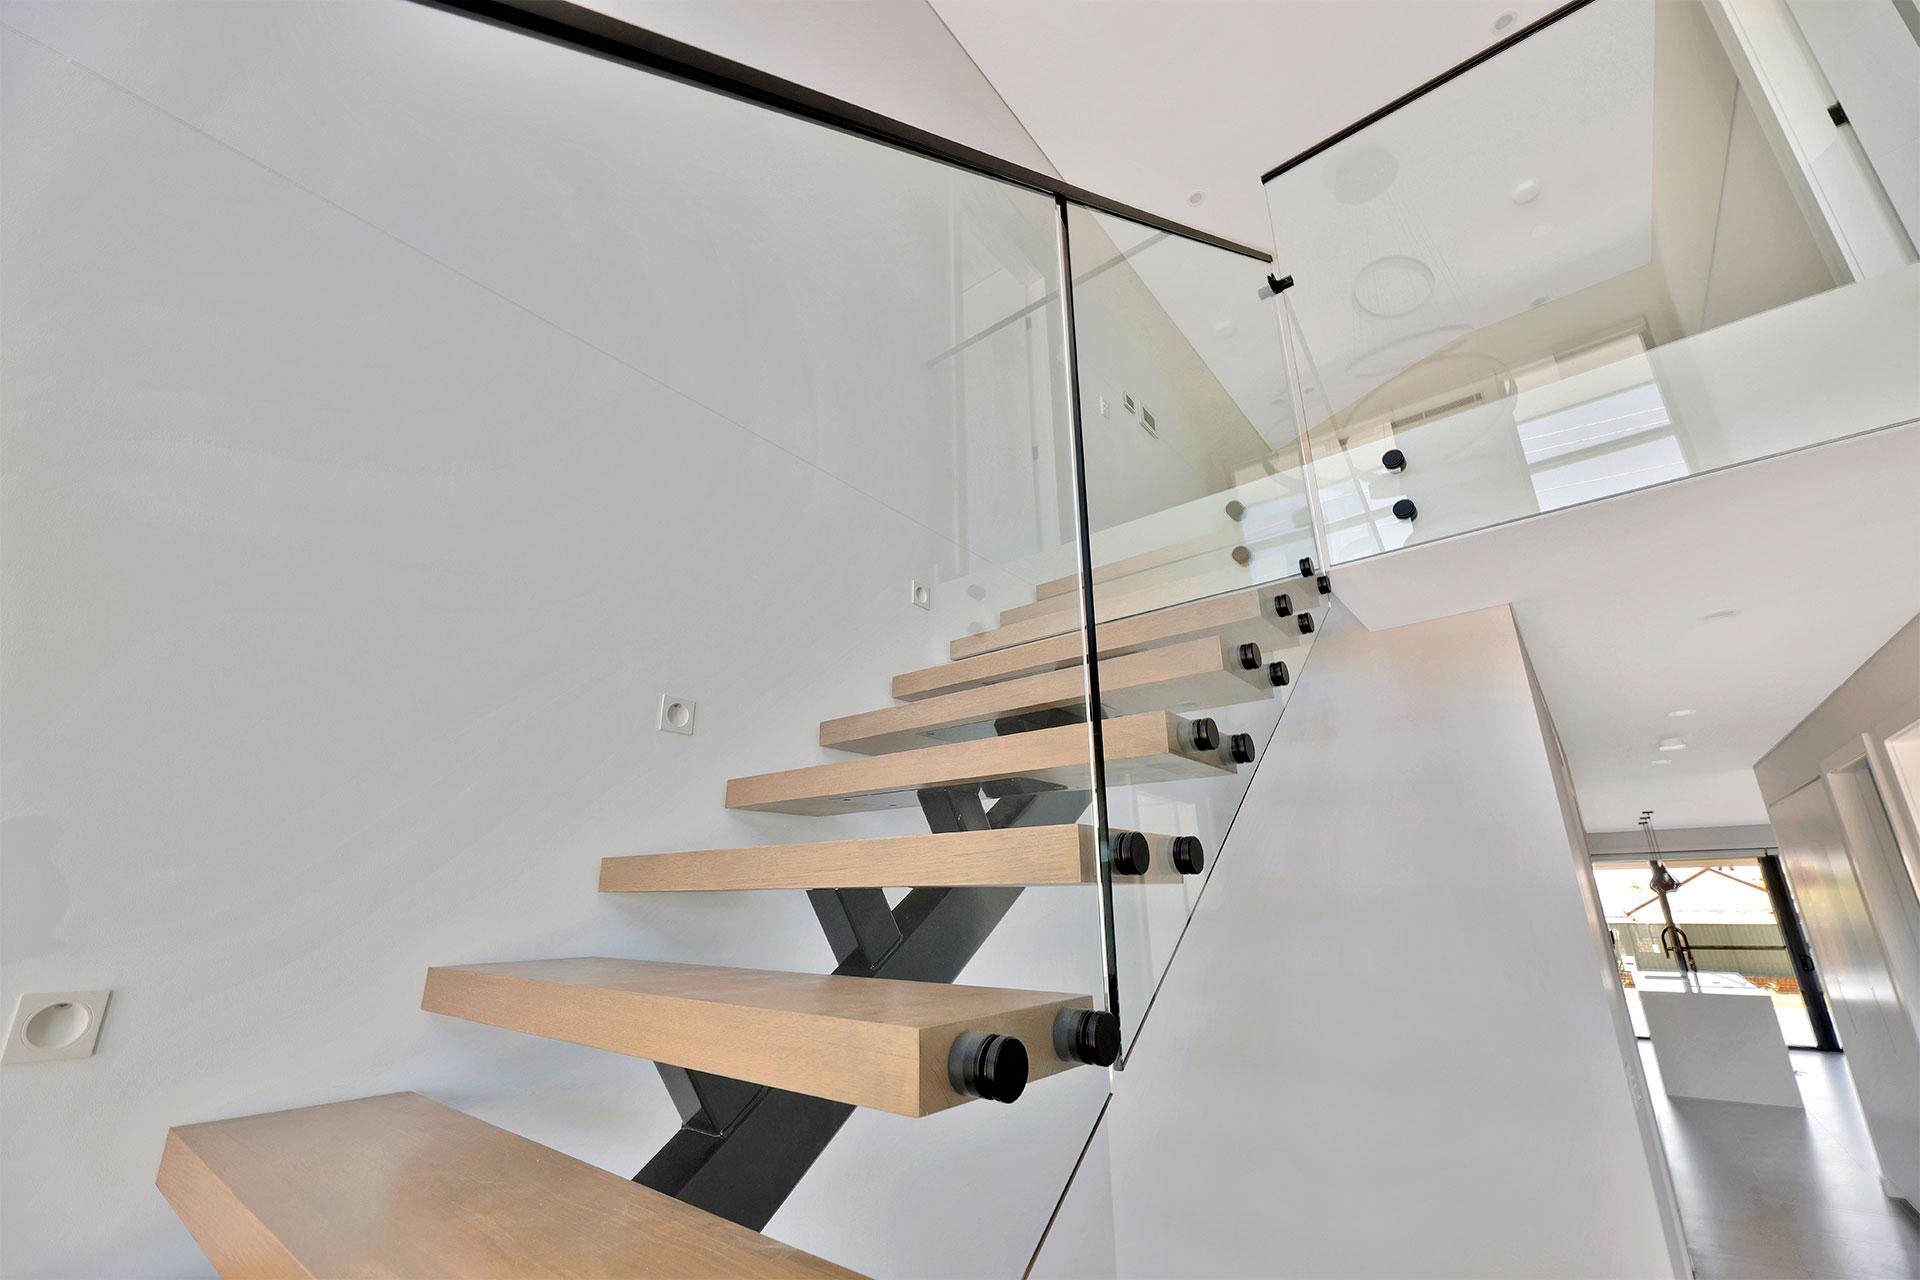 https://starwardrobes.com.au/wp-content/uploads/2021/07/Services-Glass-Balustrade.jpg